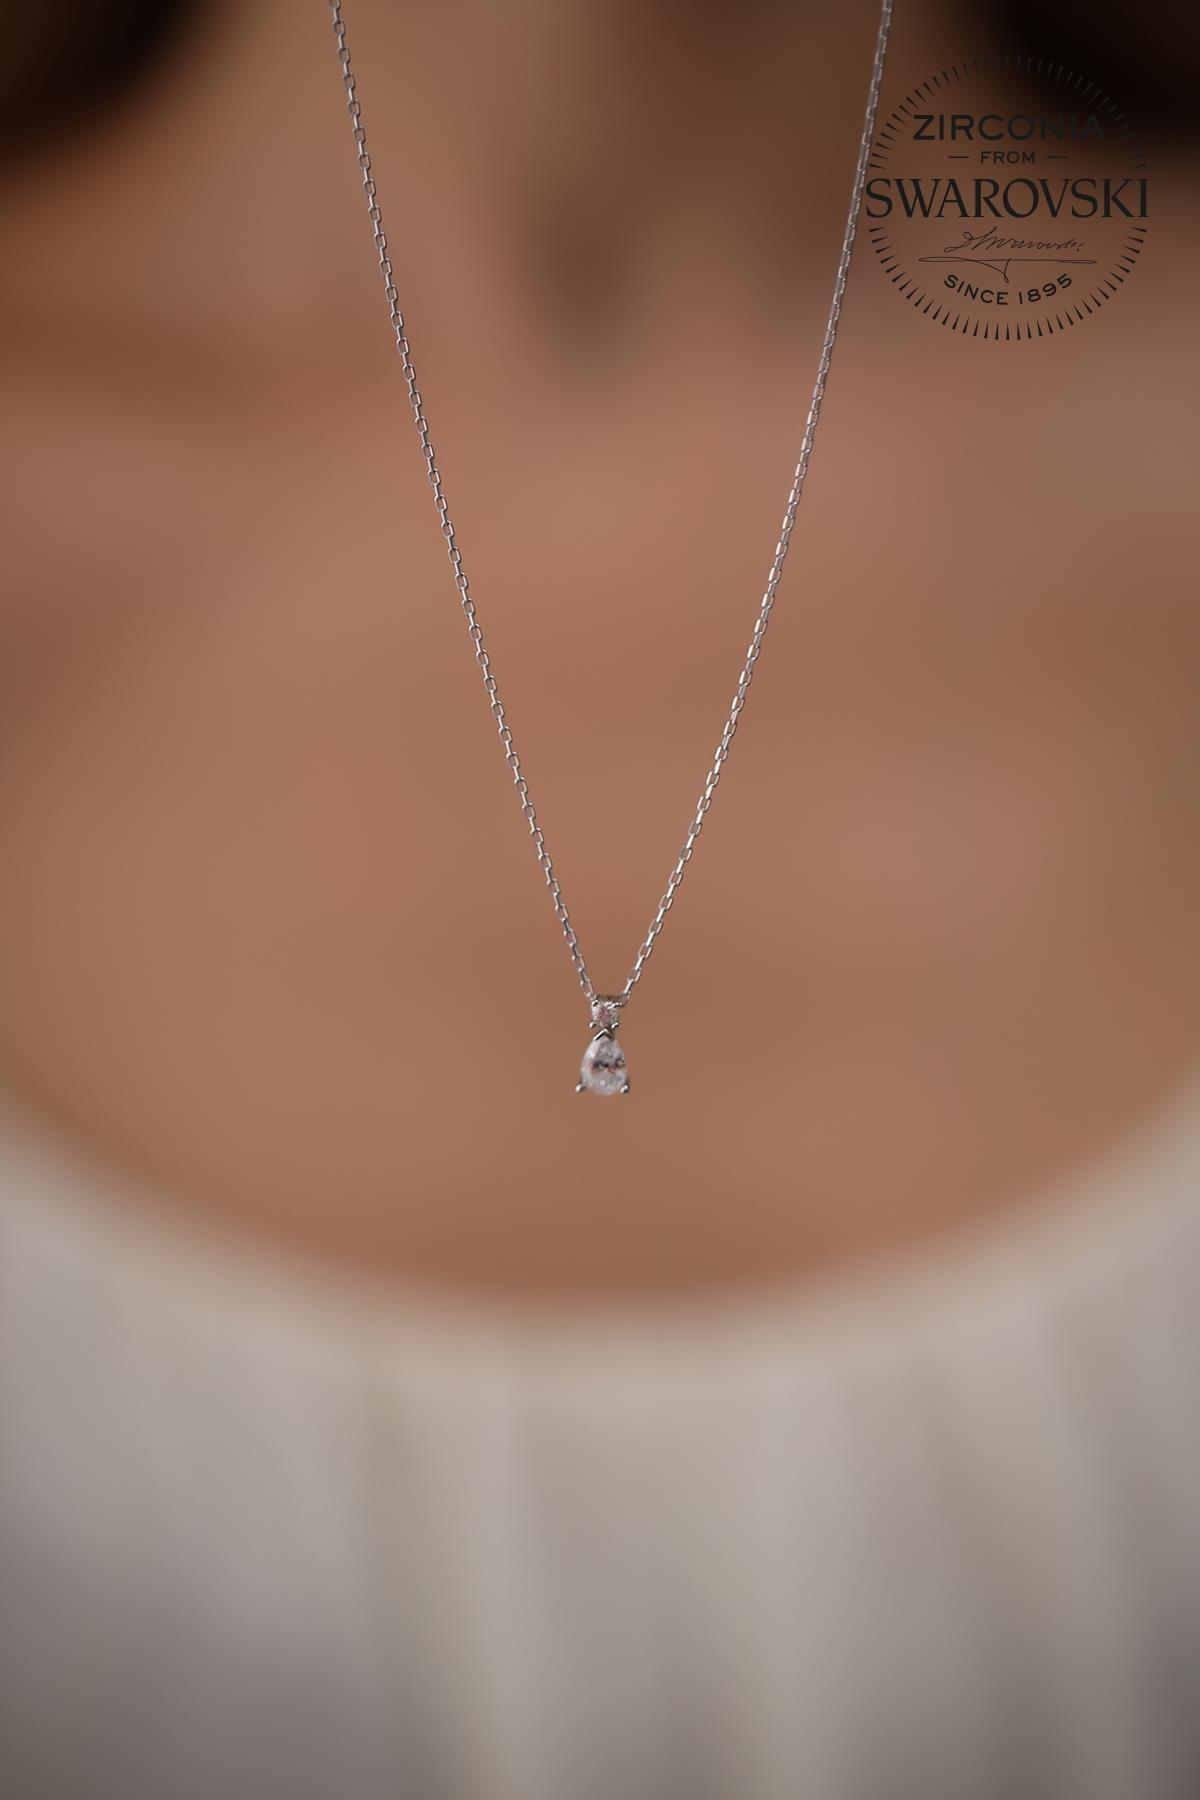 Ninova Silver Kadın Taşlı Damla Model Gümüş Kolye 1